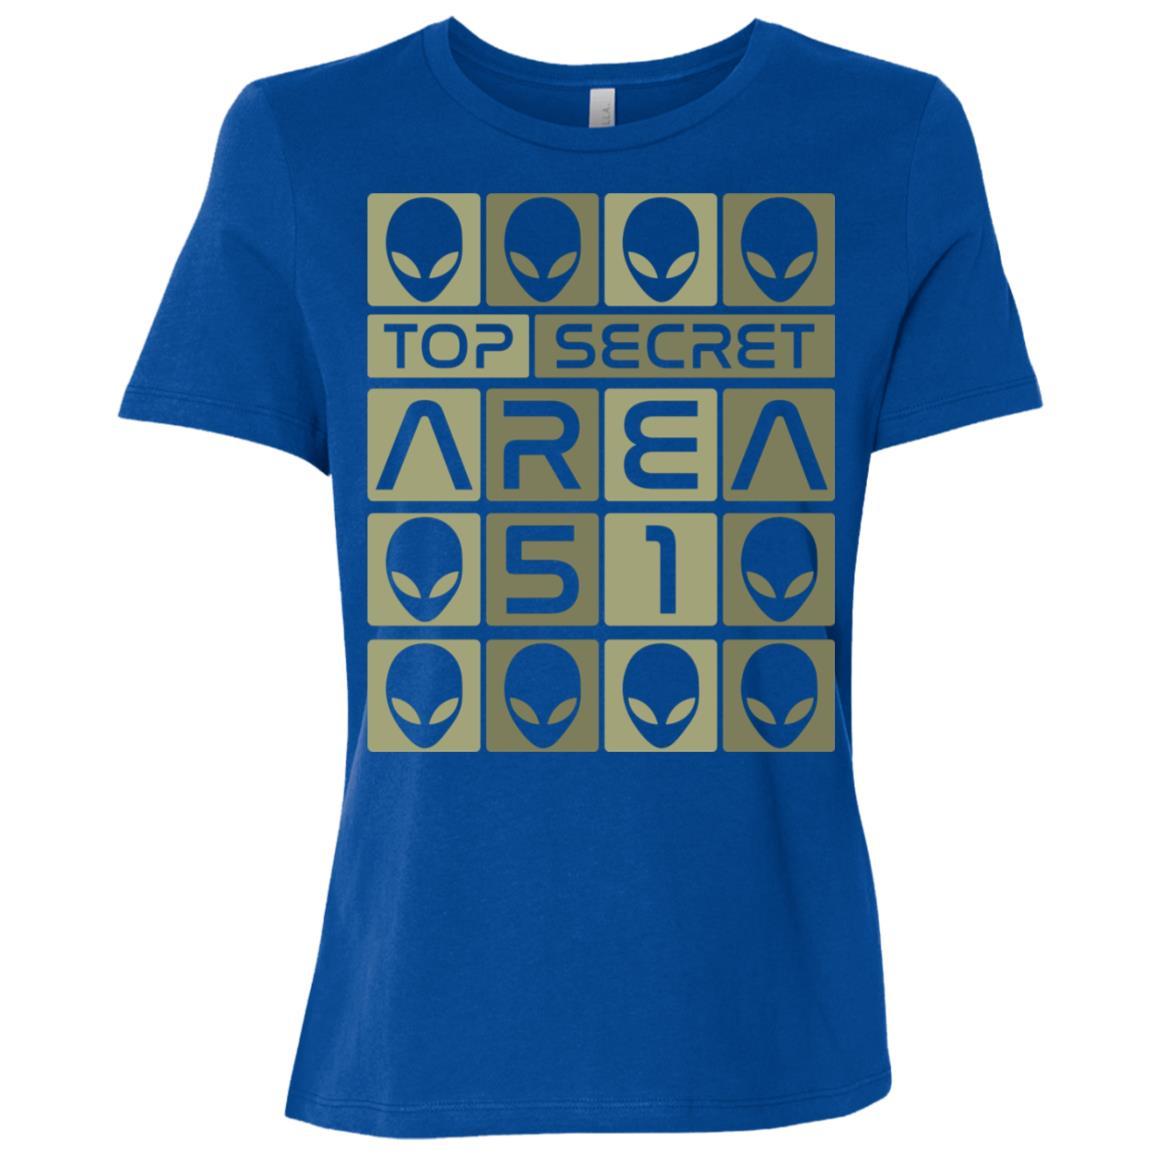 Ufo Top Secret Area 51 Women Short Sleeve T-Shirt